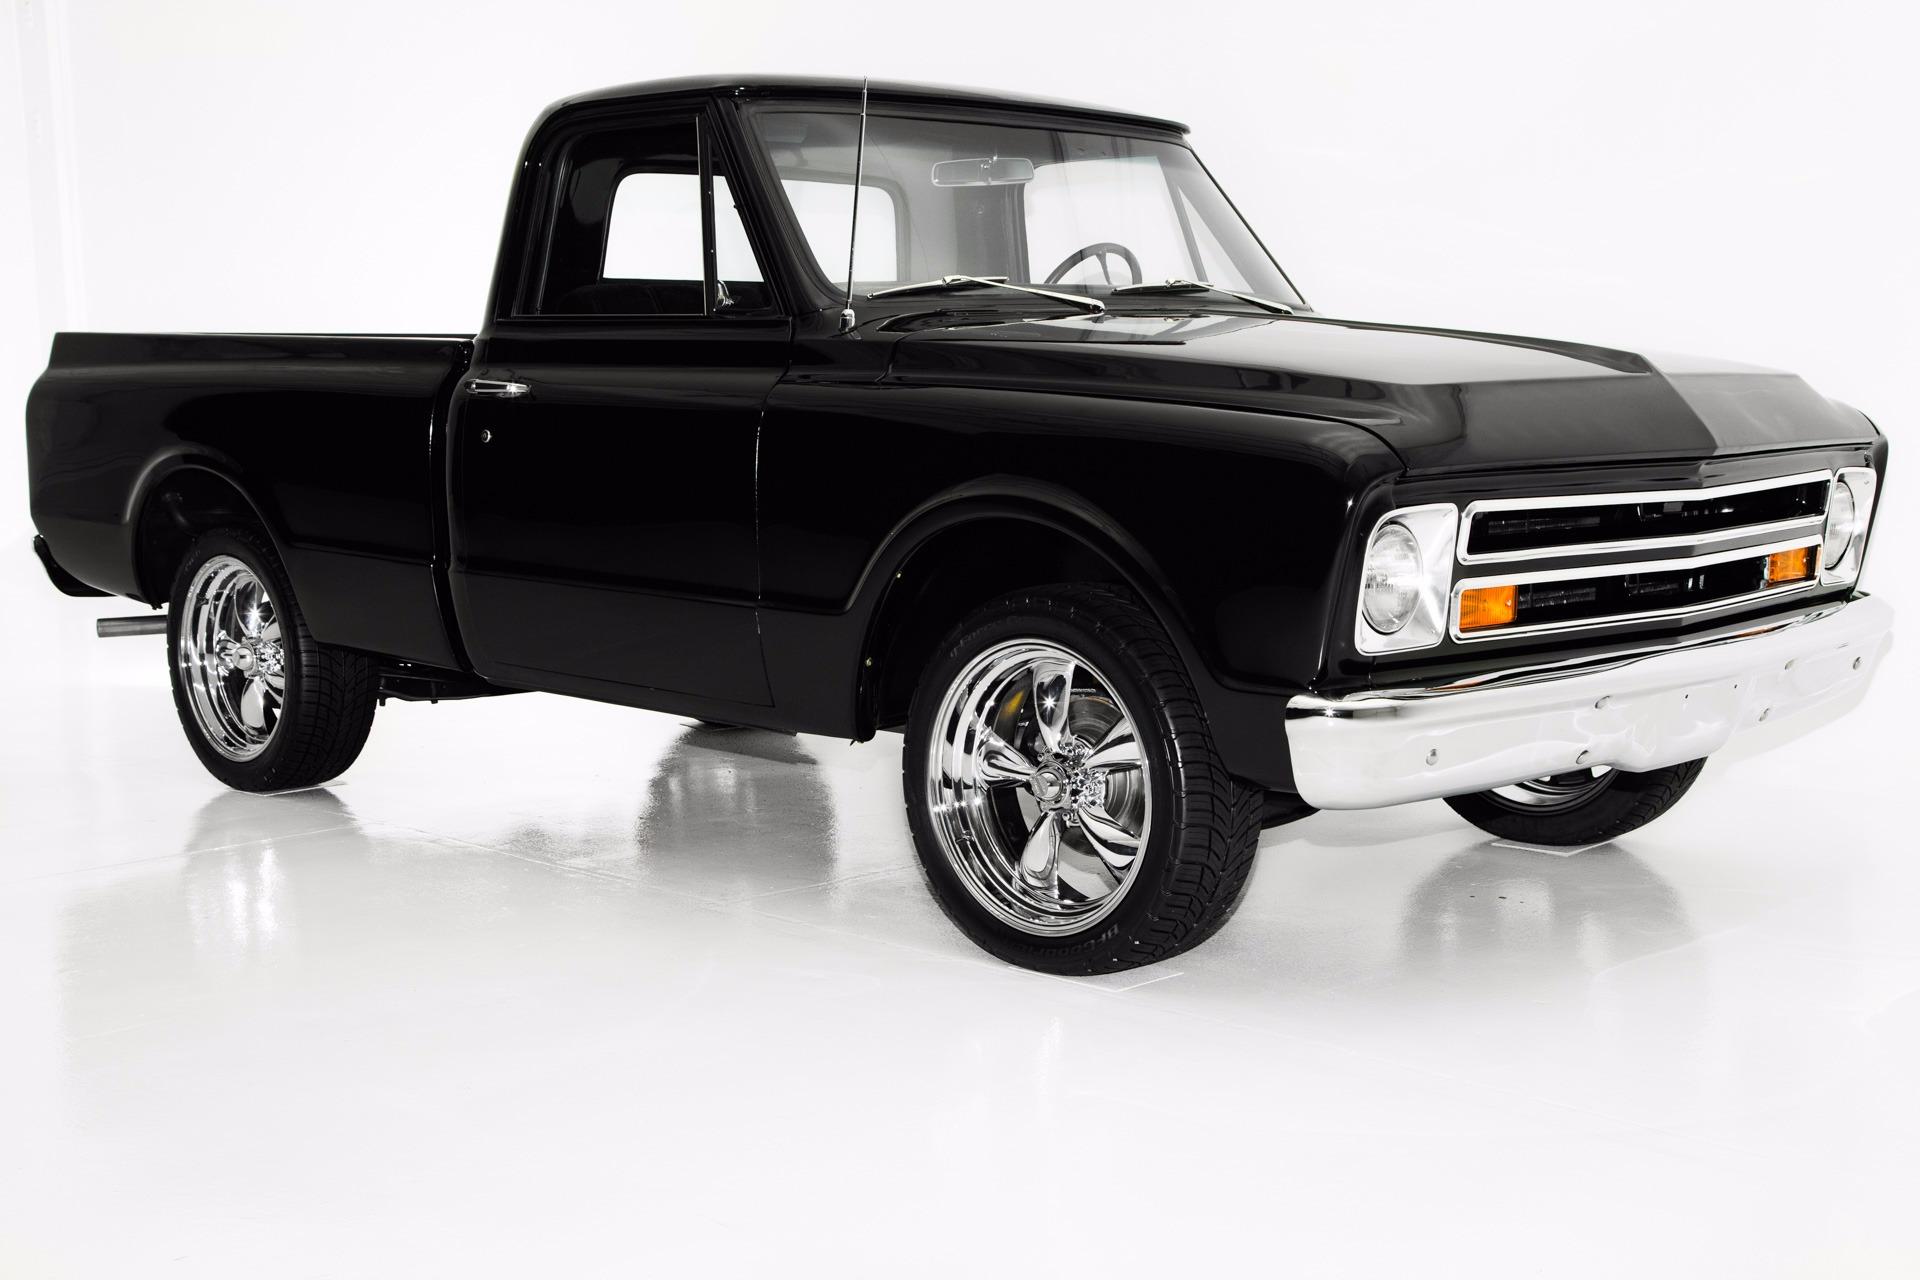 1967 Chevrolet Pickup Black C10 Frame Off